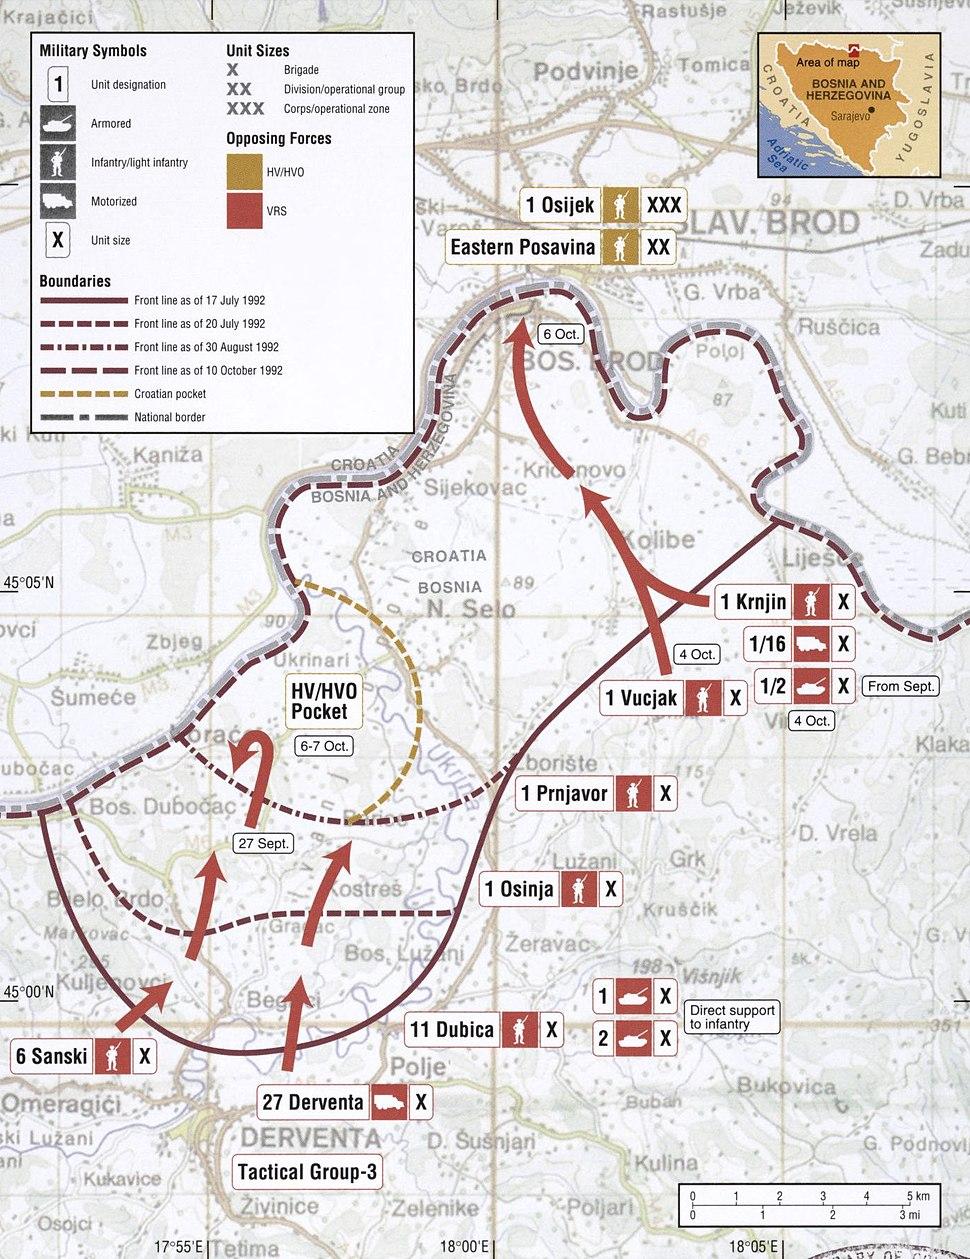 Map 12 - Bosnia - Bosanski Brod - July-October 1992